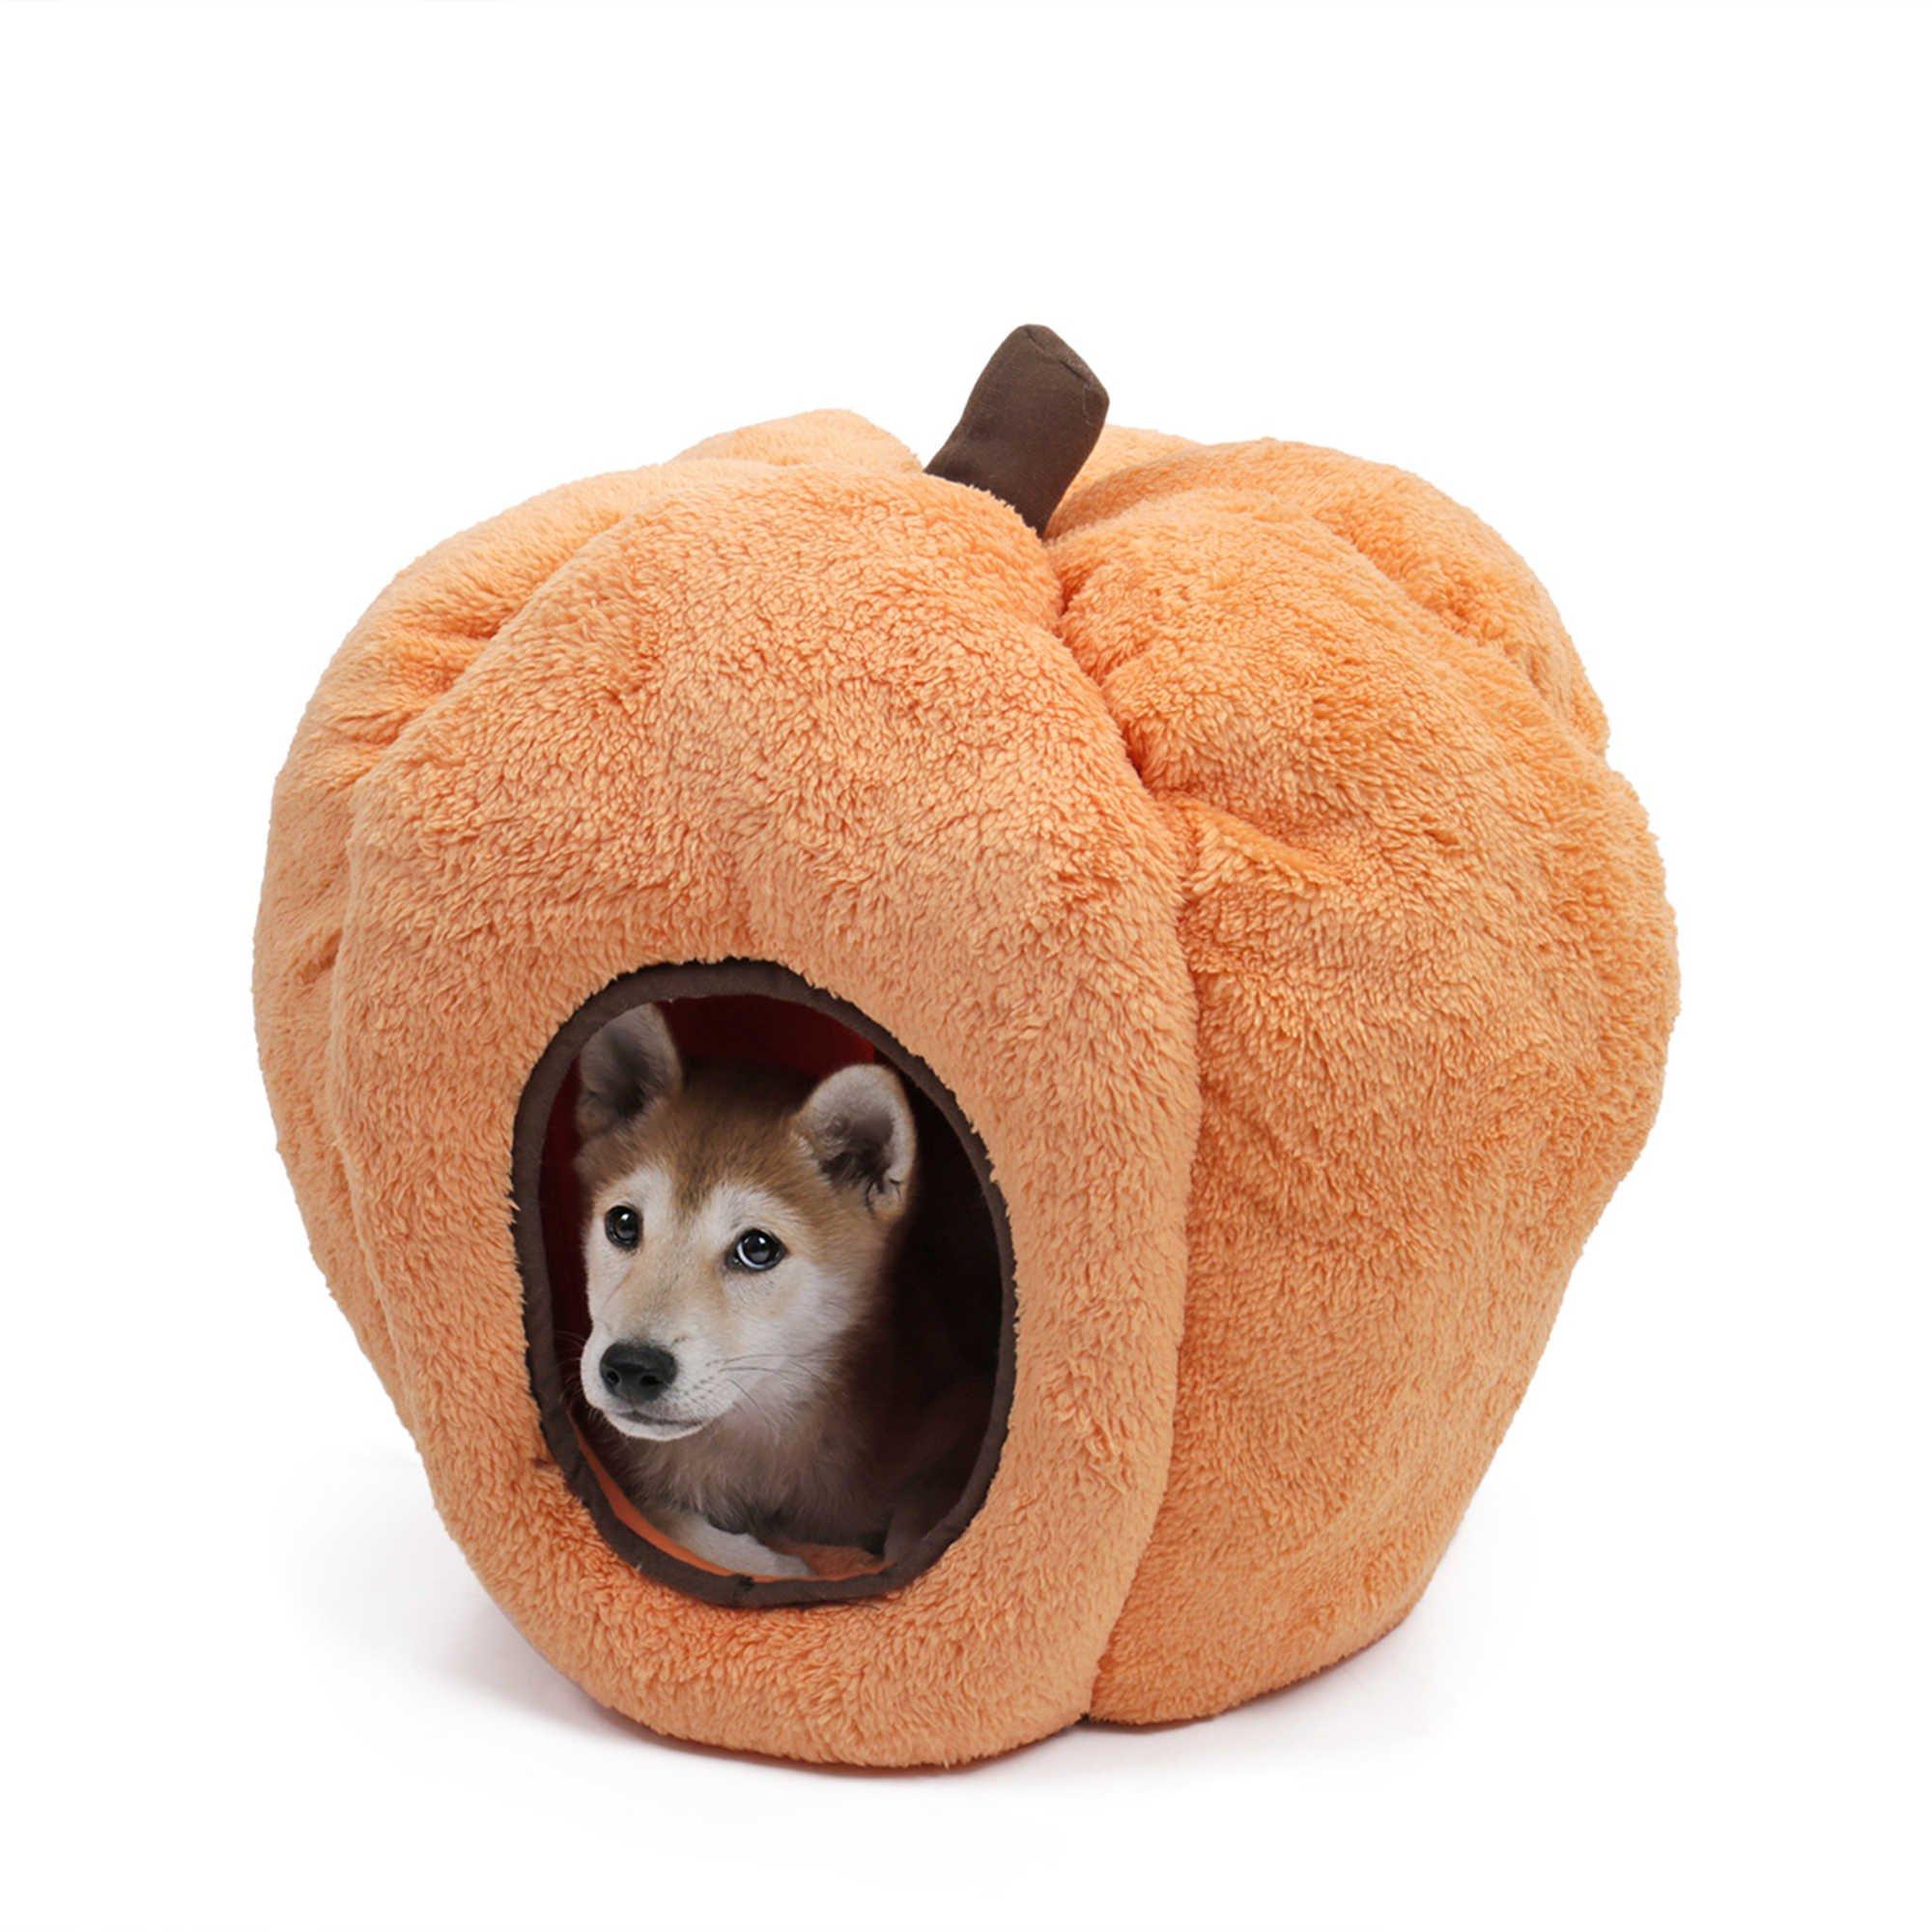 Excellent Speedy Pet Dog House Indoor Halloween Pumpkin Cat Cave Soft Fleece Warm Bed With Removable Cushion Non Slip And Durable For Puppy Kitten Medium Dog Customarchery Wood Chair Design Ideas Customarcherynet